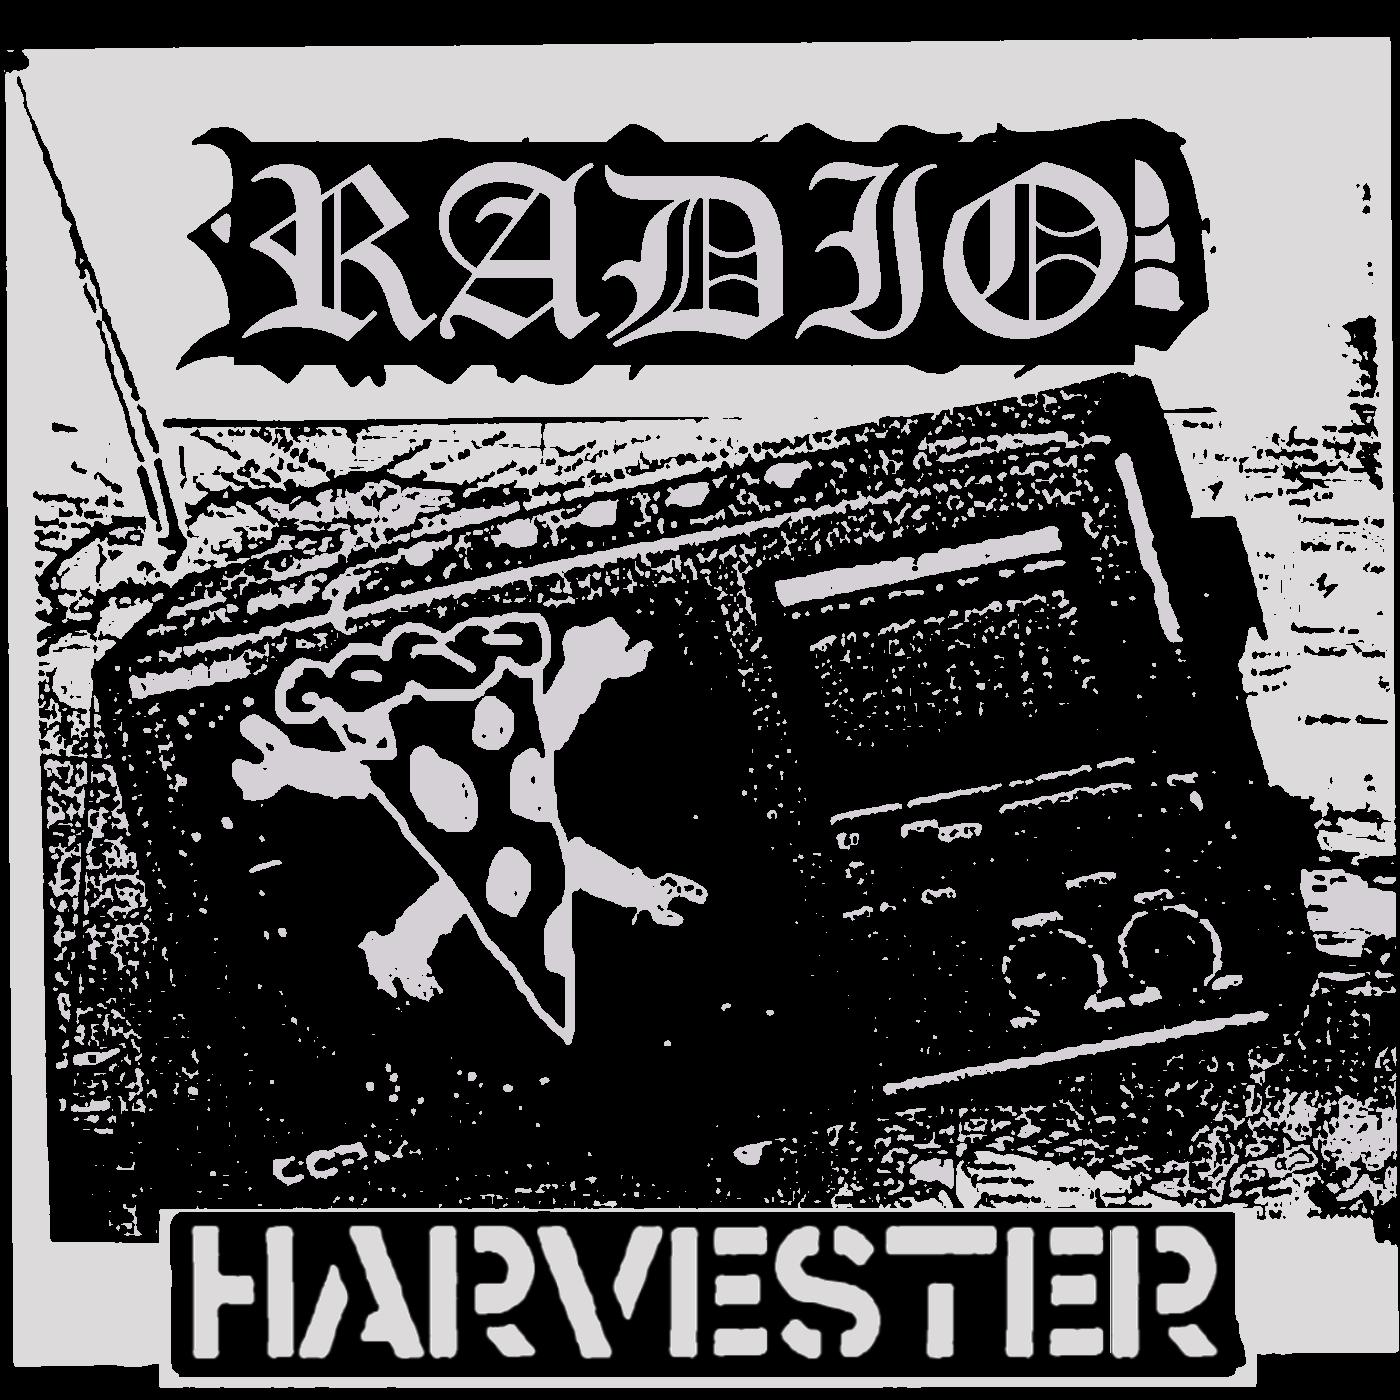 Radio Harvester